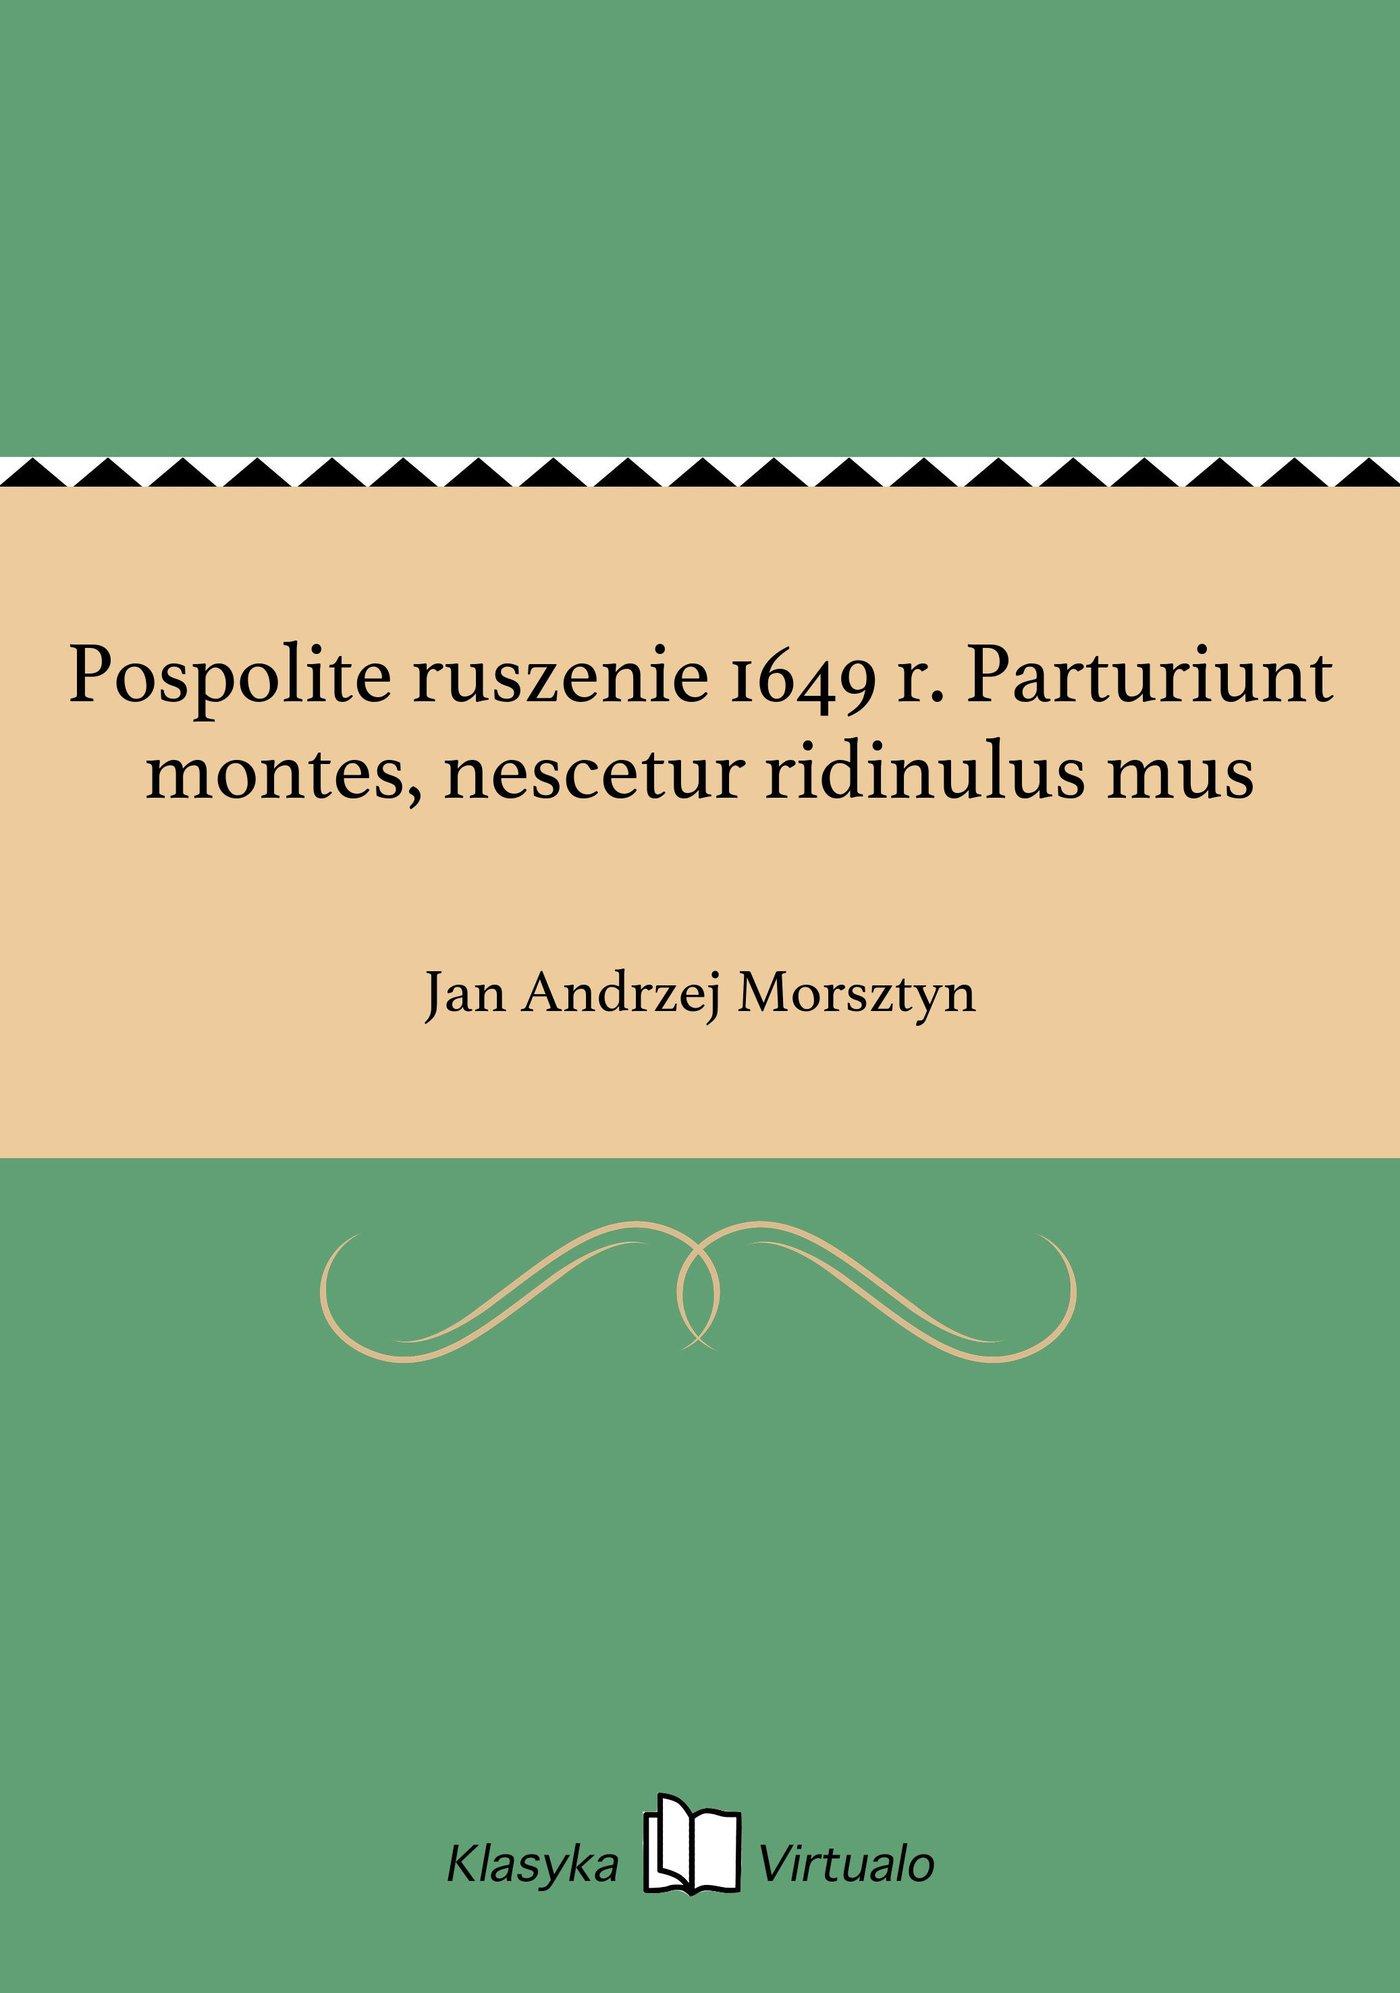 Pospolite ruszenie 1649 r. Parturiunt montes, nescetur ridinulus mus - Ebook (Książka EPUB) do pobrania w formacie EPUB